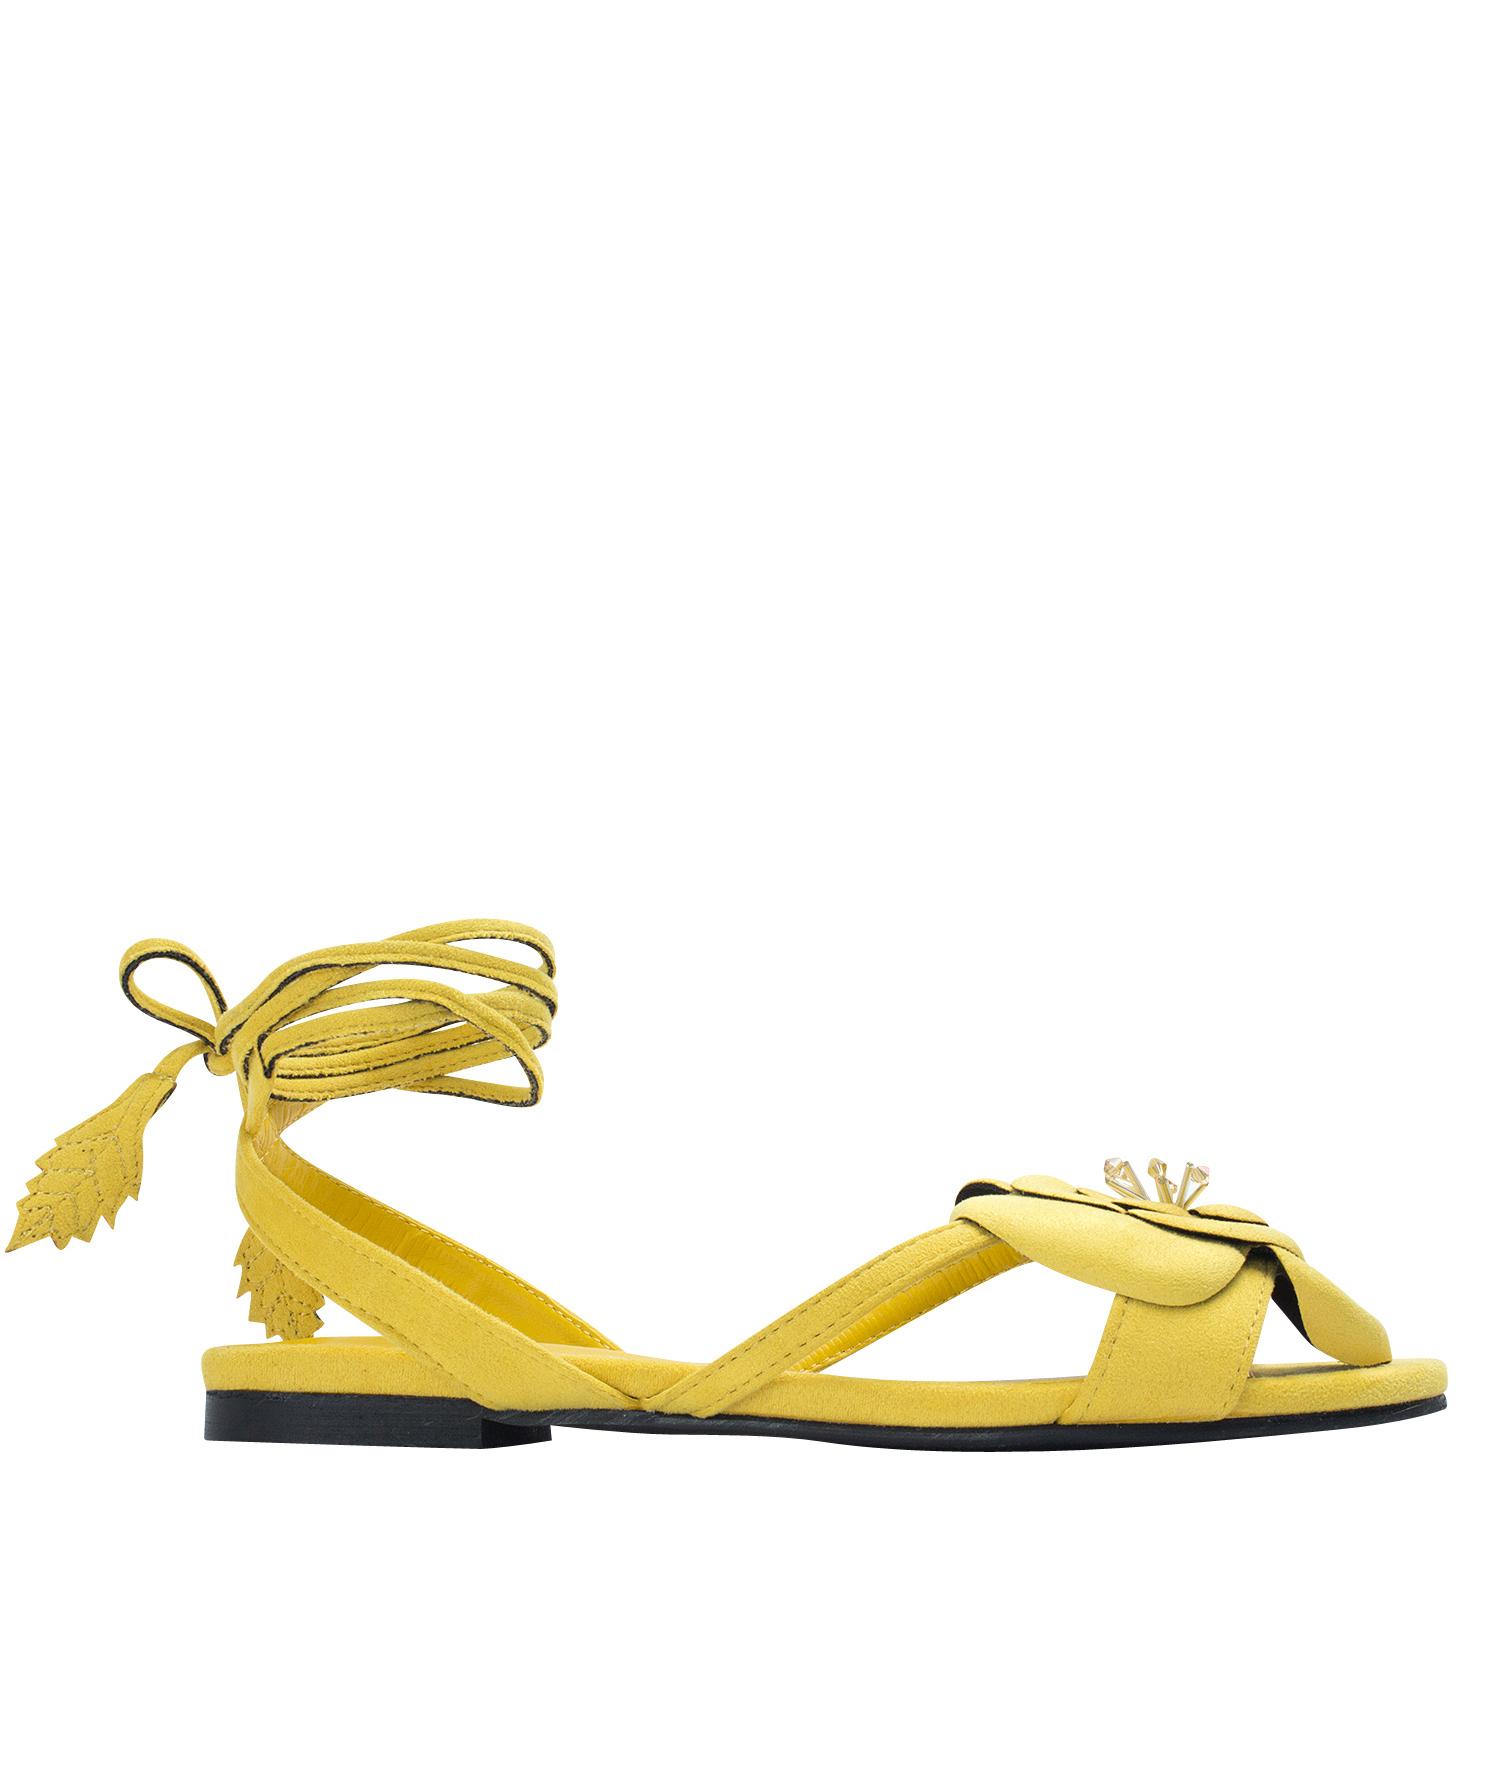 3e90de83b Annakastle Womens Flower Ankle-Wrap Flat Sandals Yellow